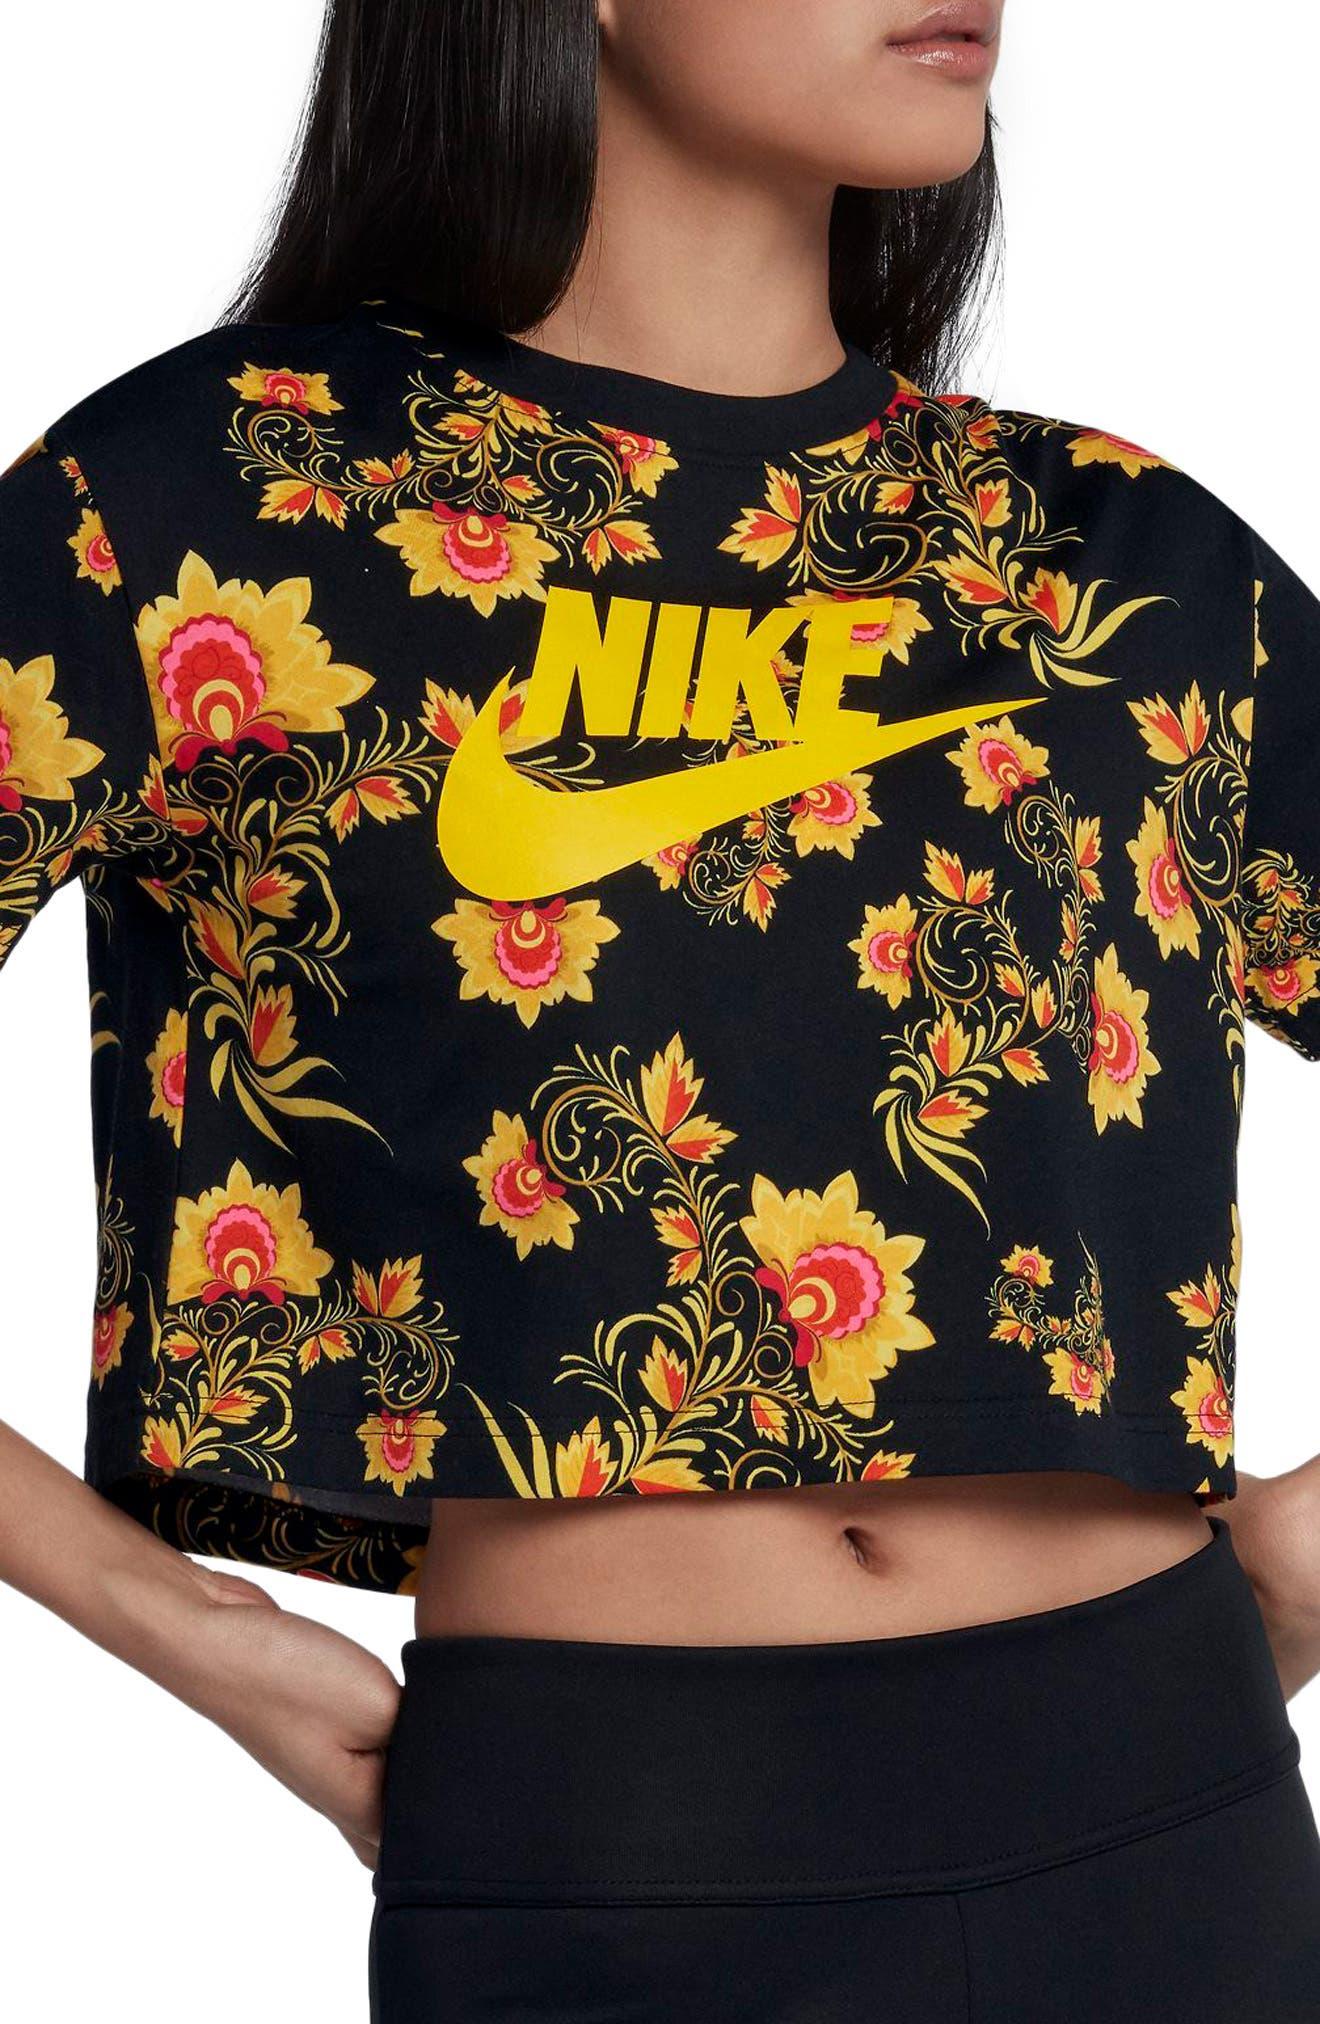 Sportswear Russian Floral Print Crop Tee,                             Main thumbnail 1, color,                             010